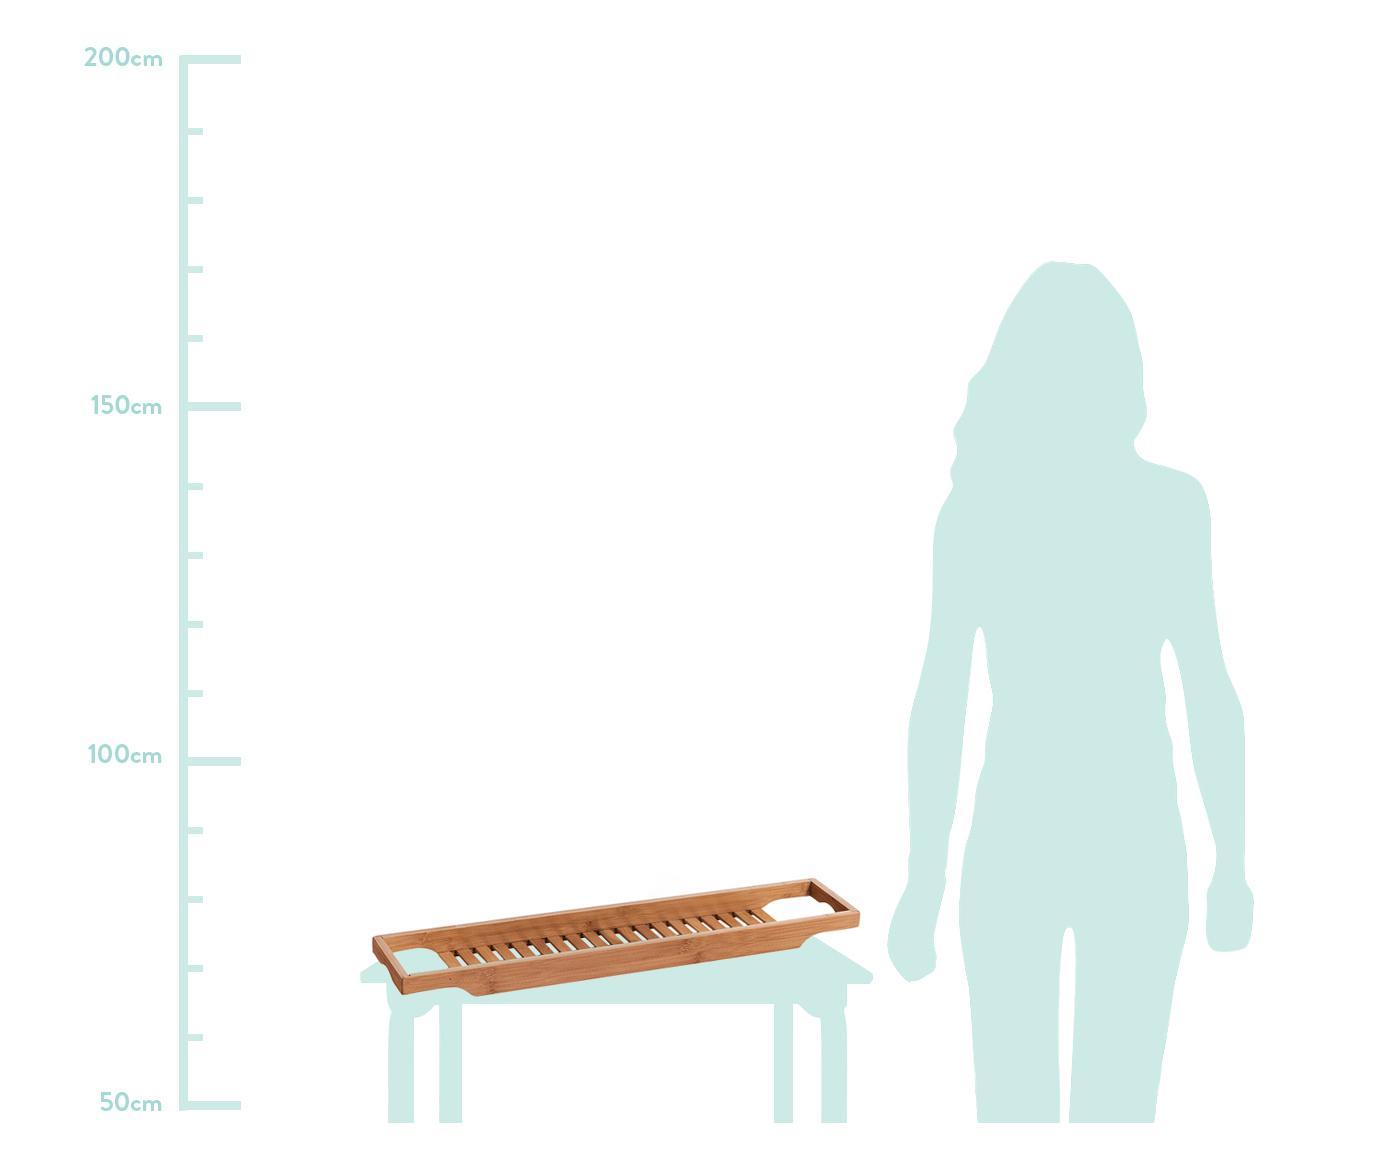 Mensoletta per la vasca Bambel in bambù, Bambù, Marrone, Larg. 70 x Alt. 5 cm